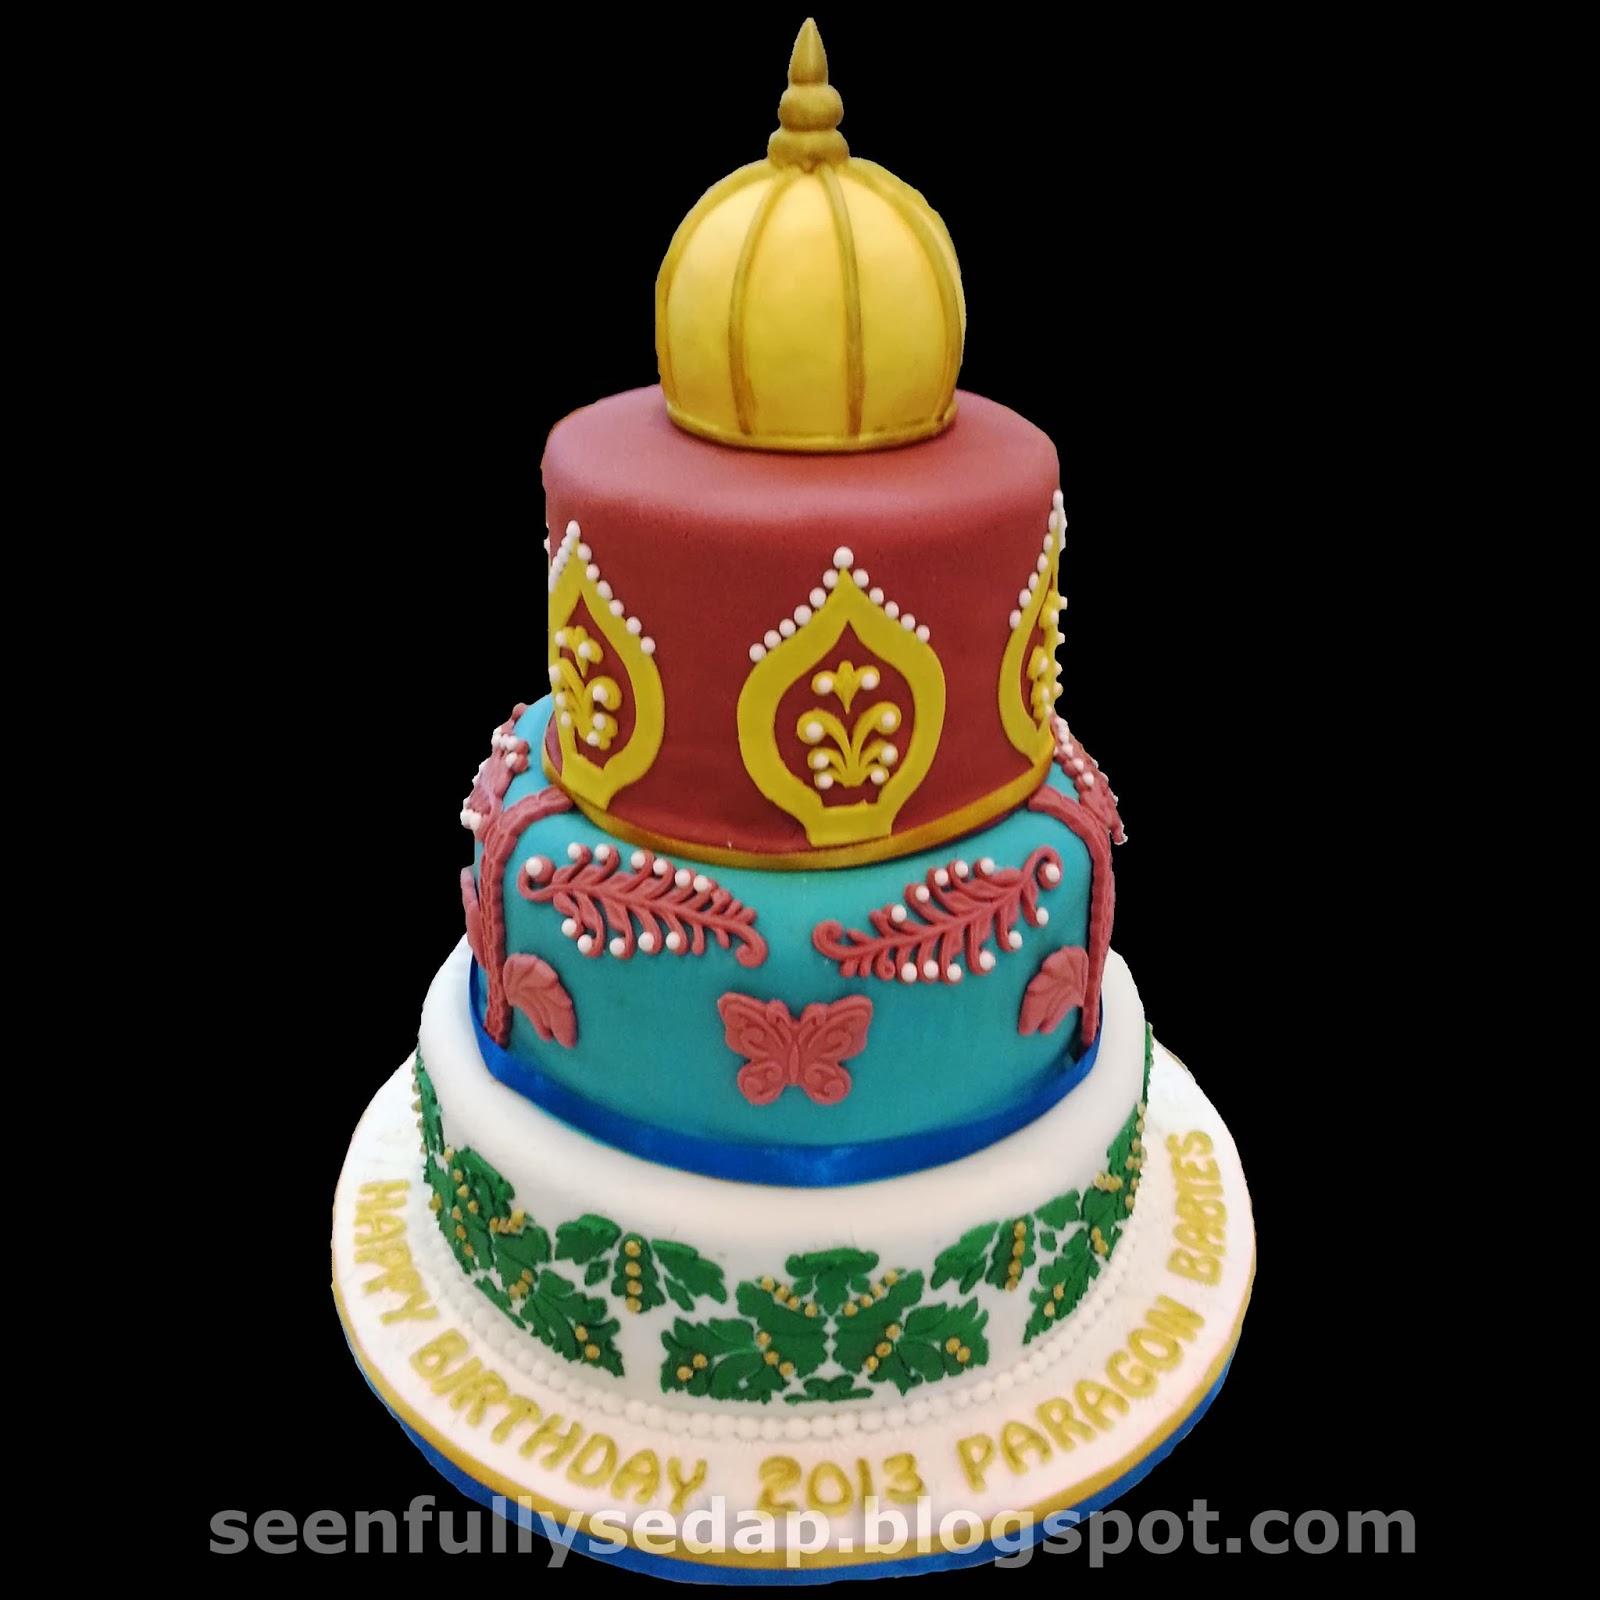 Seenfully sedap arabian theme birthday cake for Arabian cake decoration